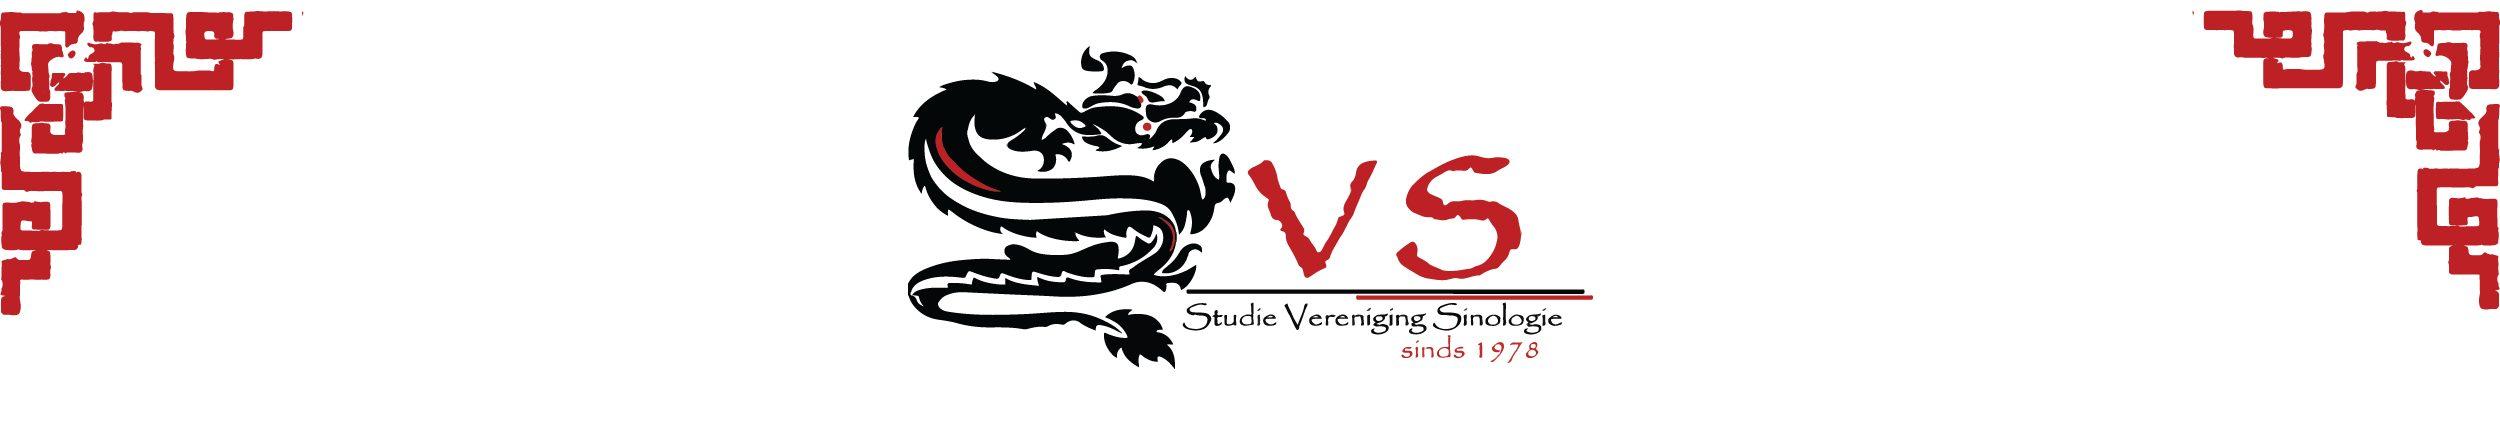 Studievereniging Sinologie Leiden